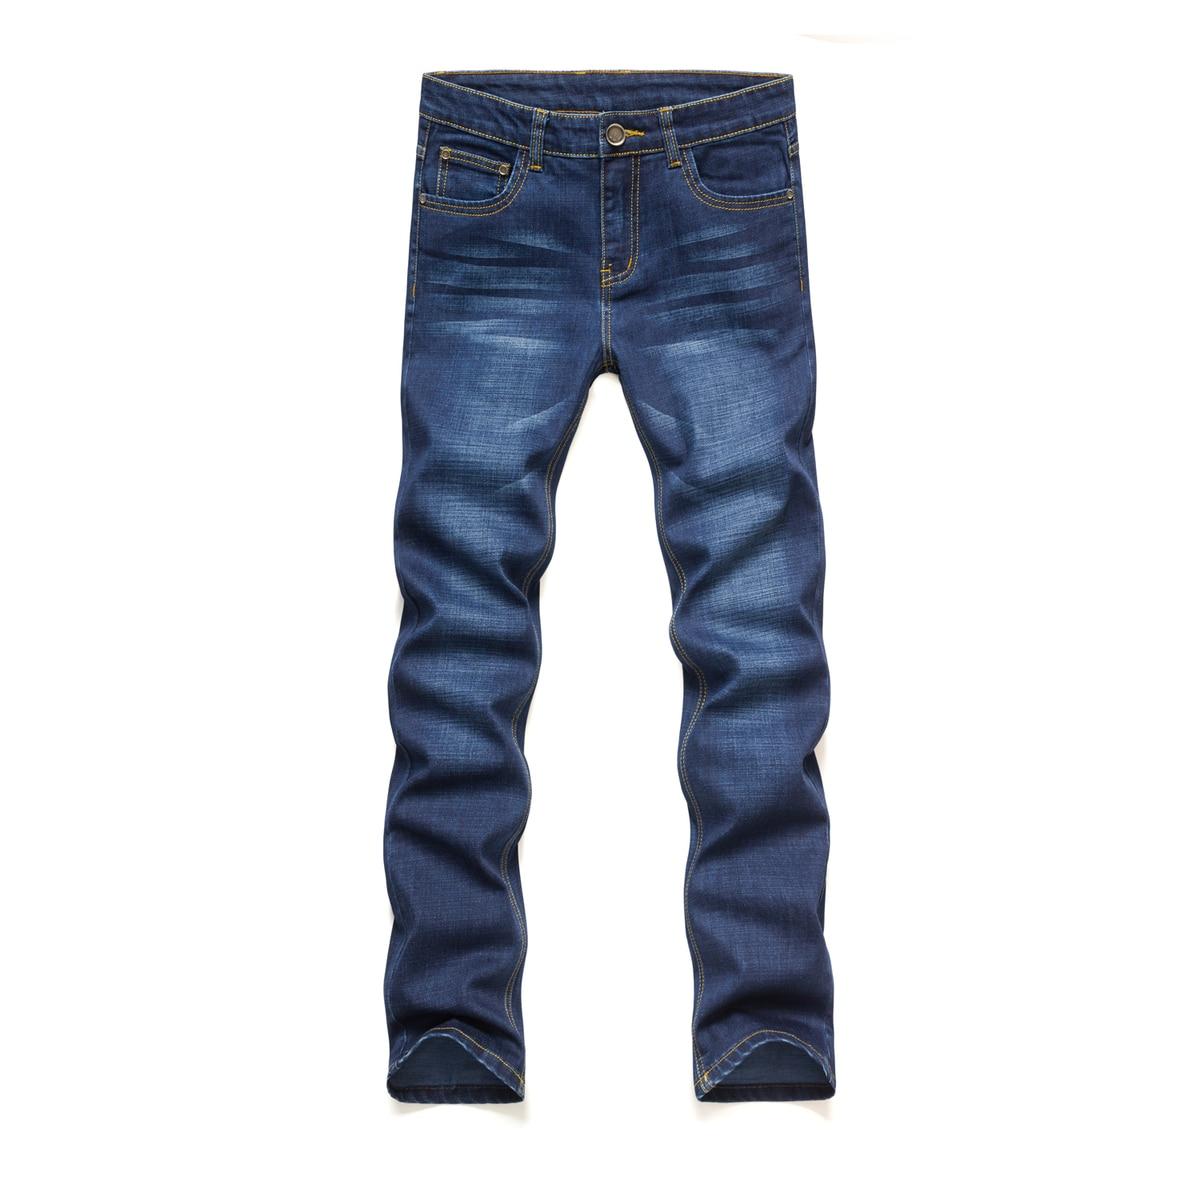 2017 Autumn New Male Elastic Business Affairs Leisure Time Man Pencil Pants men big size blue Jeans Free shippingÎäåæäà è àêñåññóàðû<br><br>